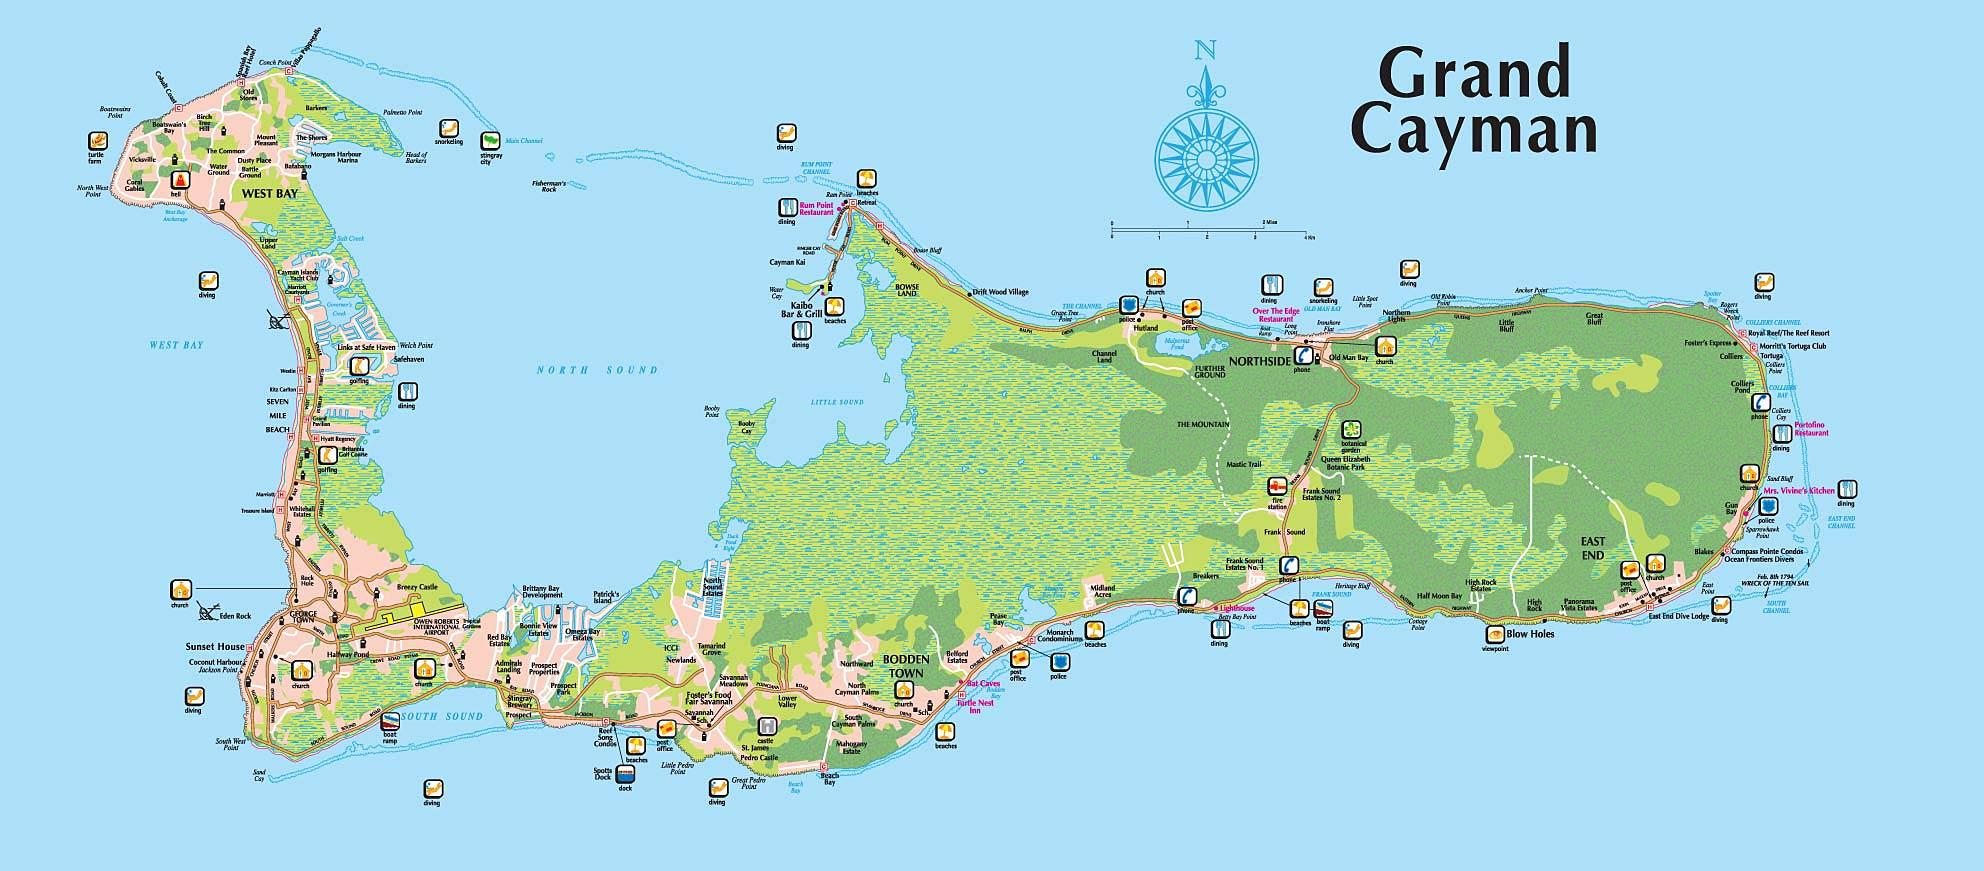 Praise & Harmony Workshop in Grand Cayman